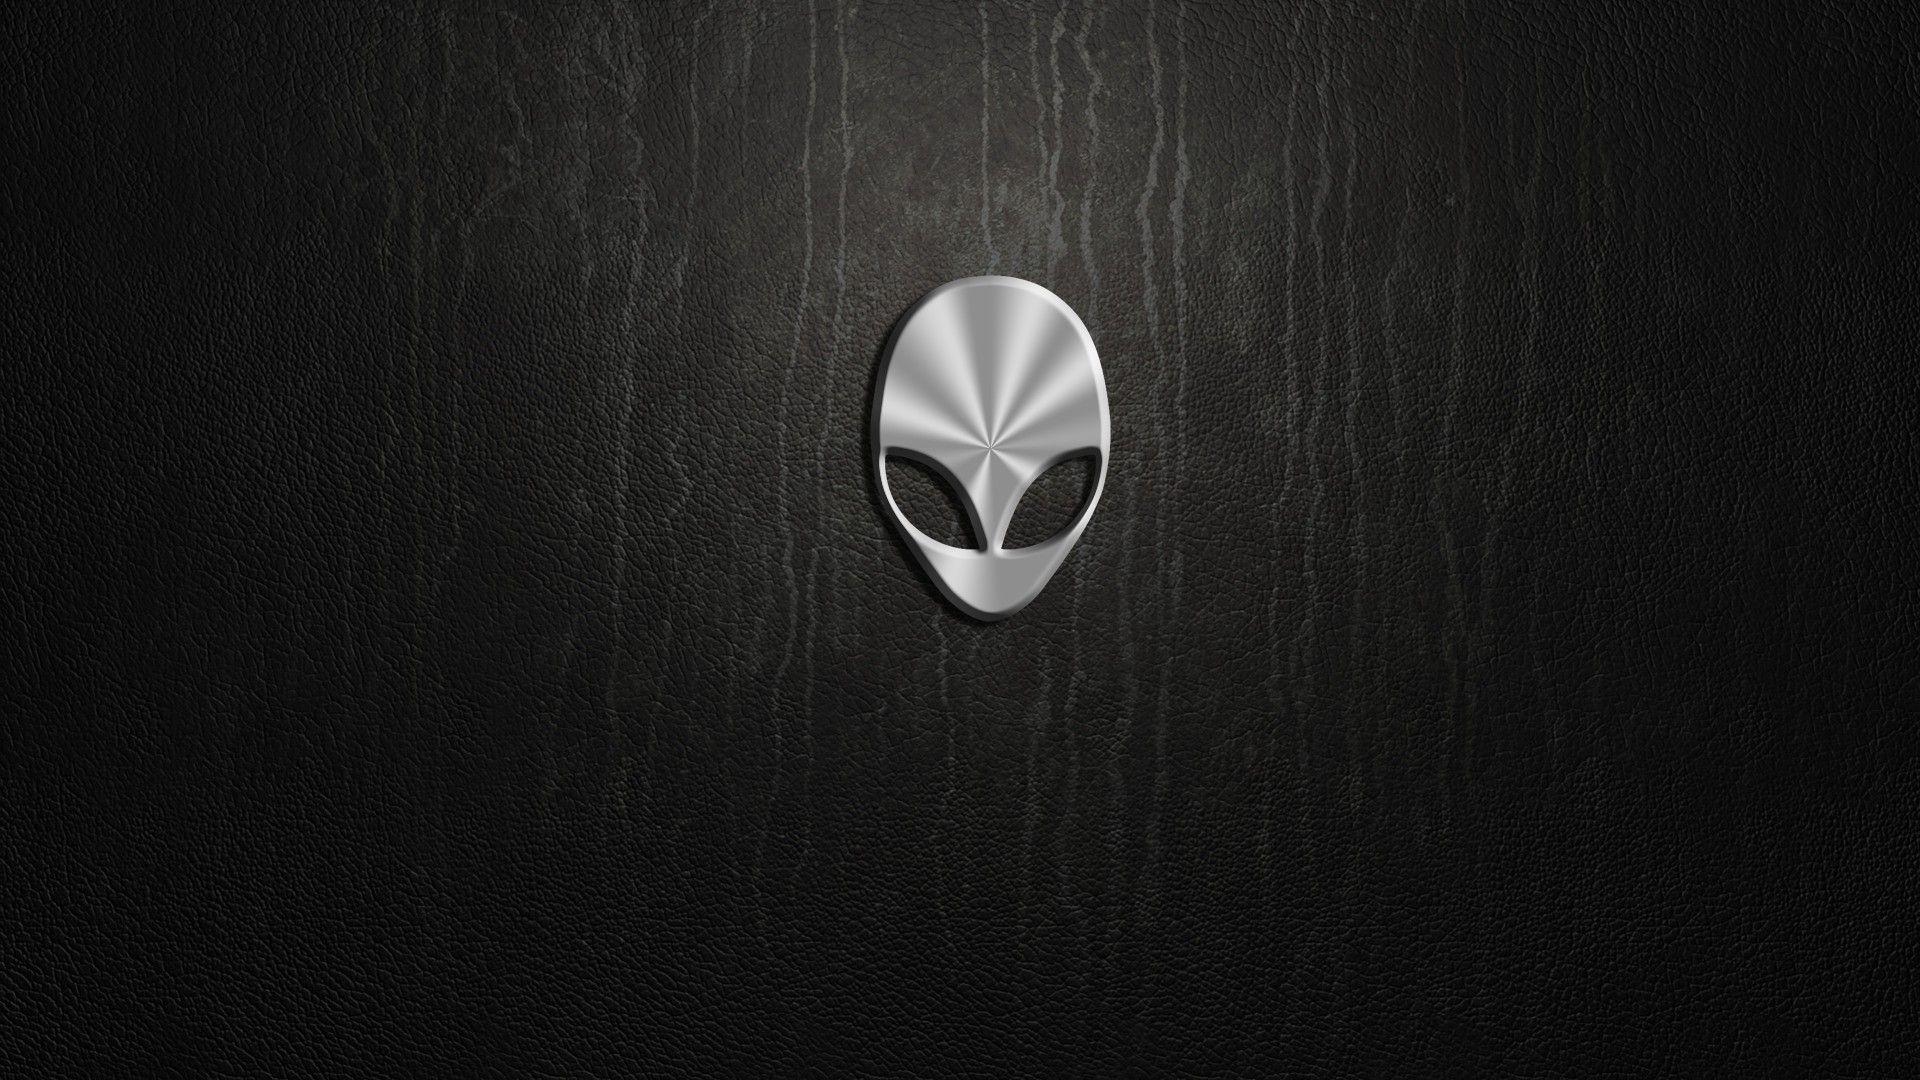 Wallpaper X Px Alienware Brand X